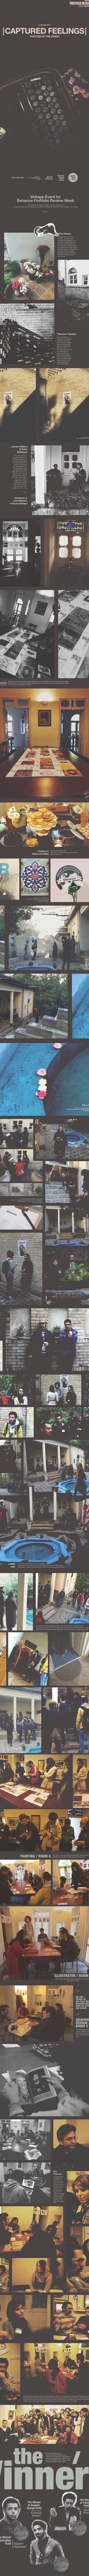 | Captured Feelings | Behance Portfolio Review Tehran on Behance